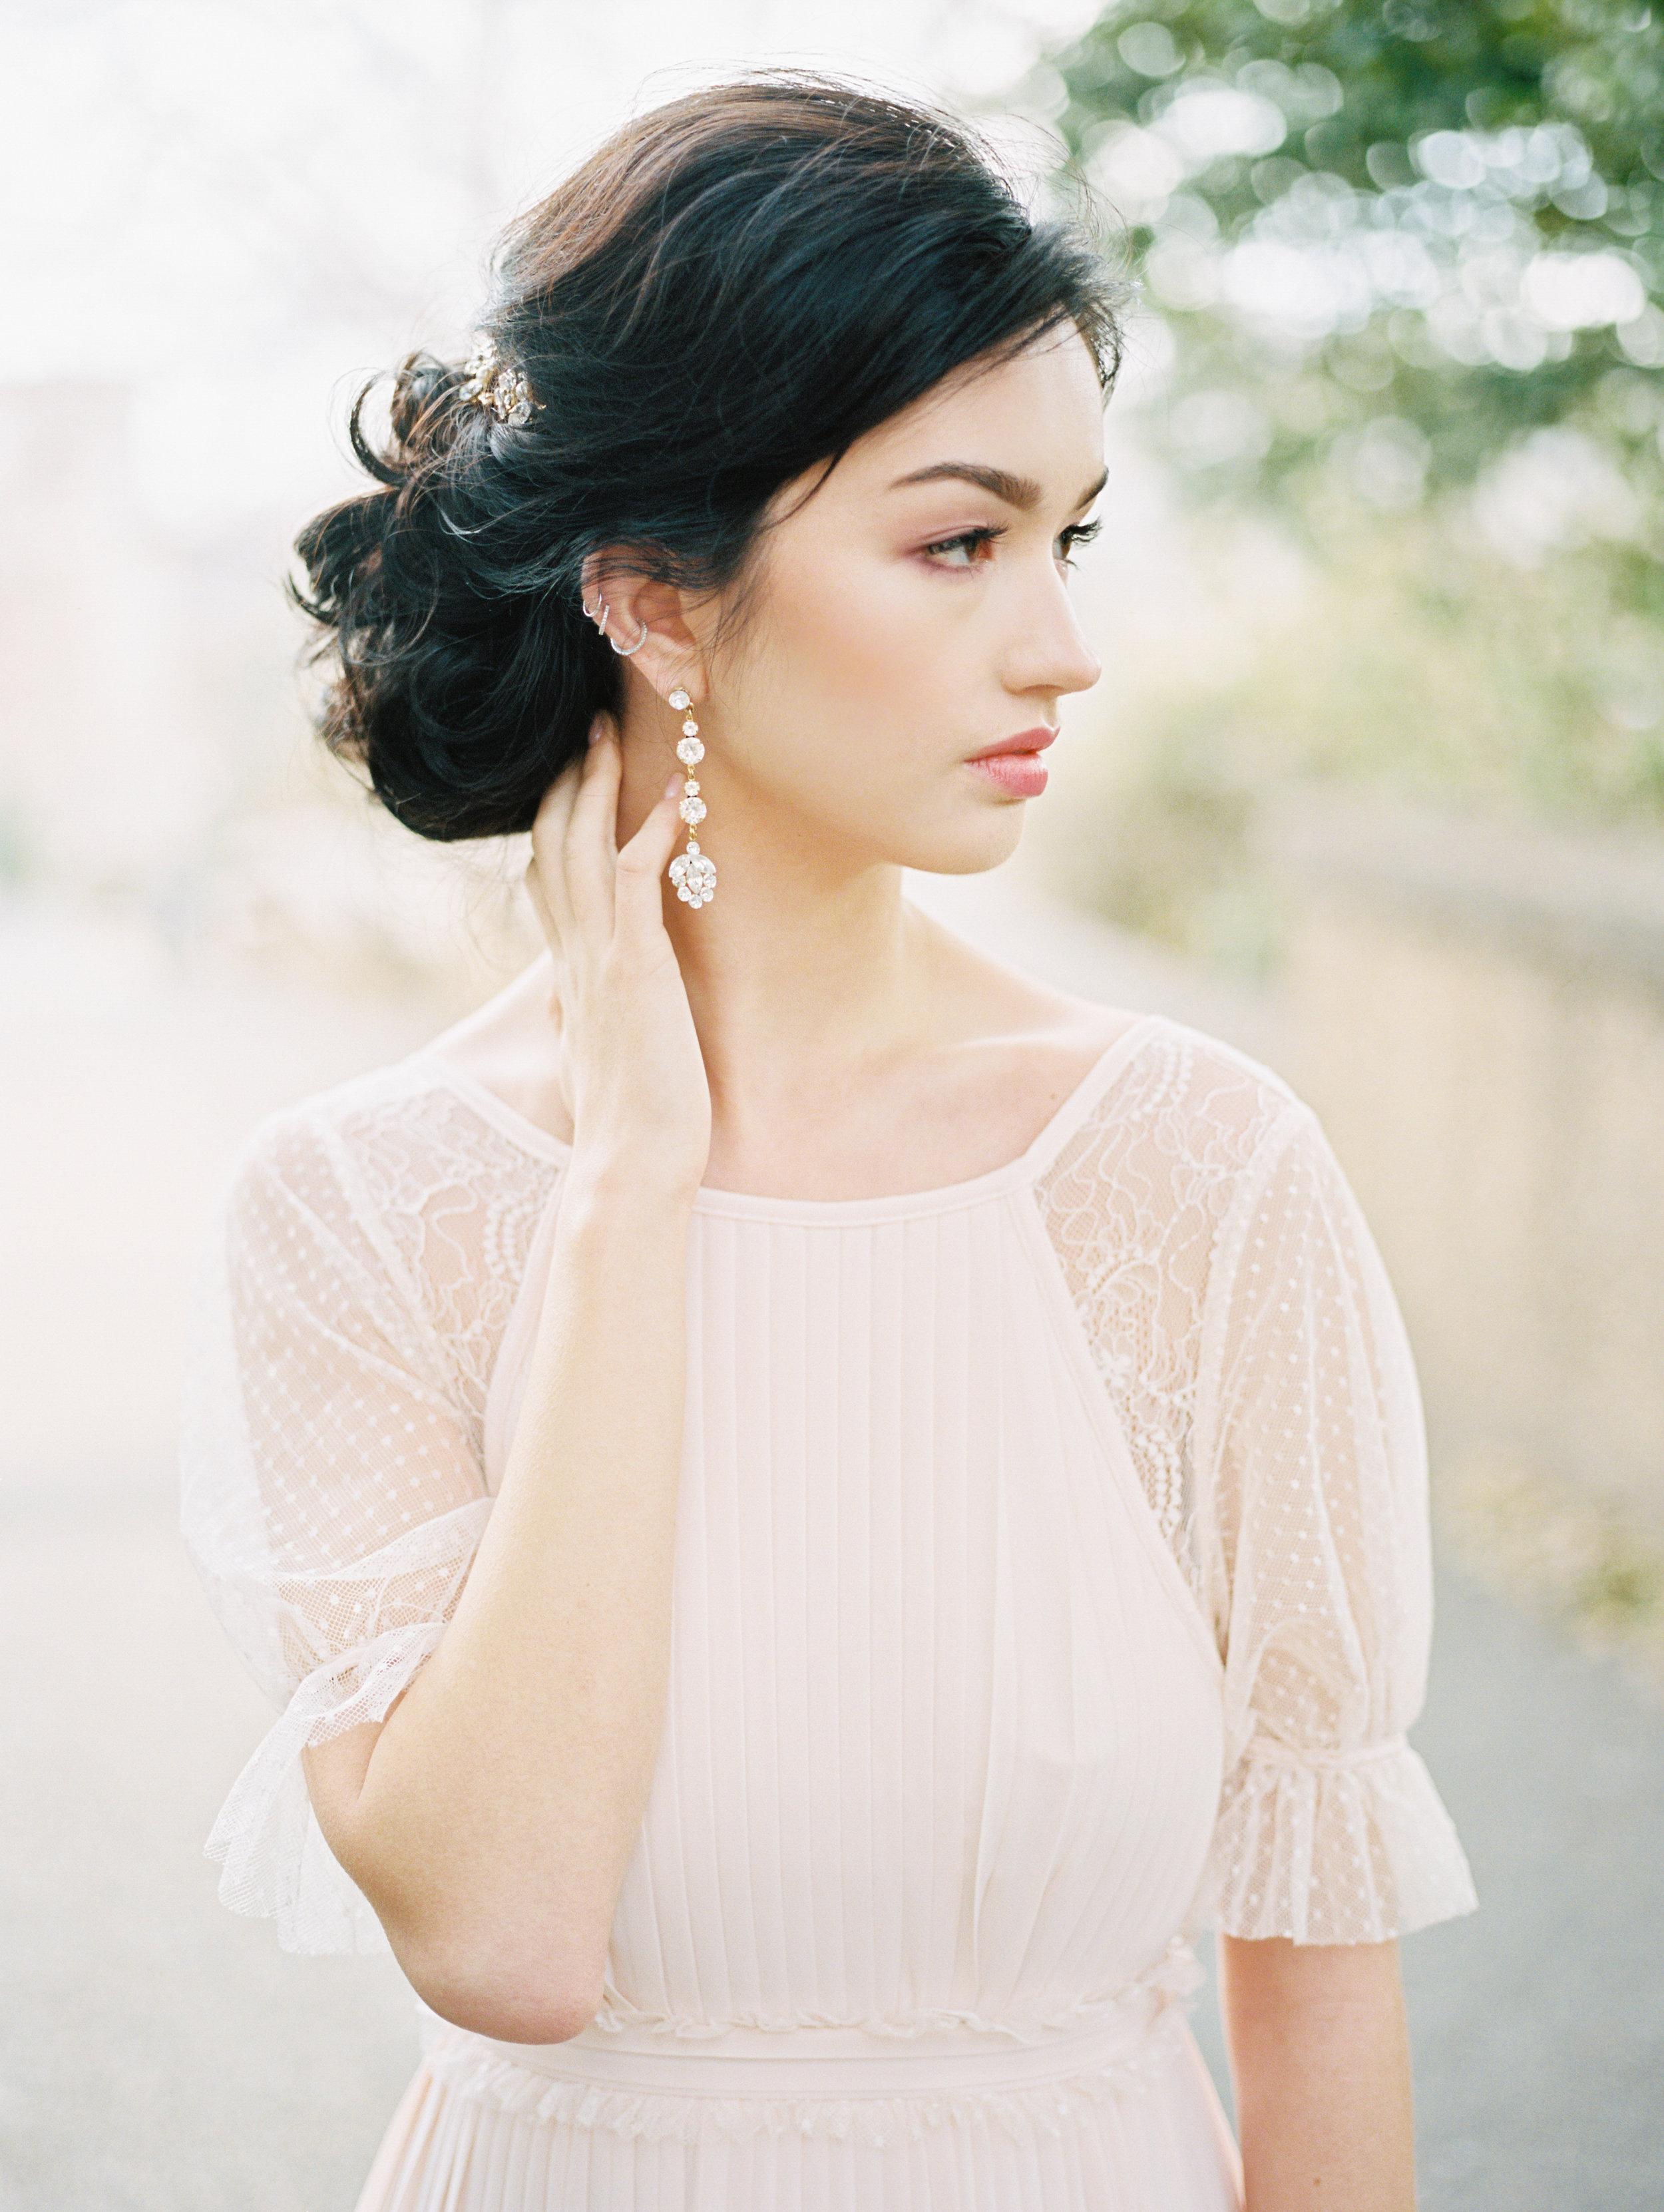 lindsay-marie-design-bridal-accessories